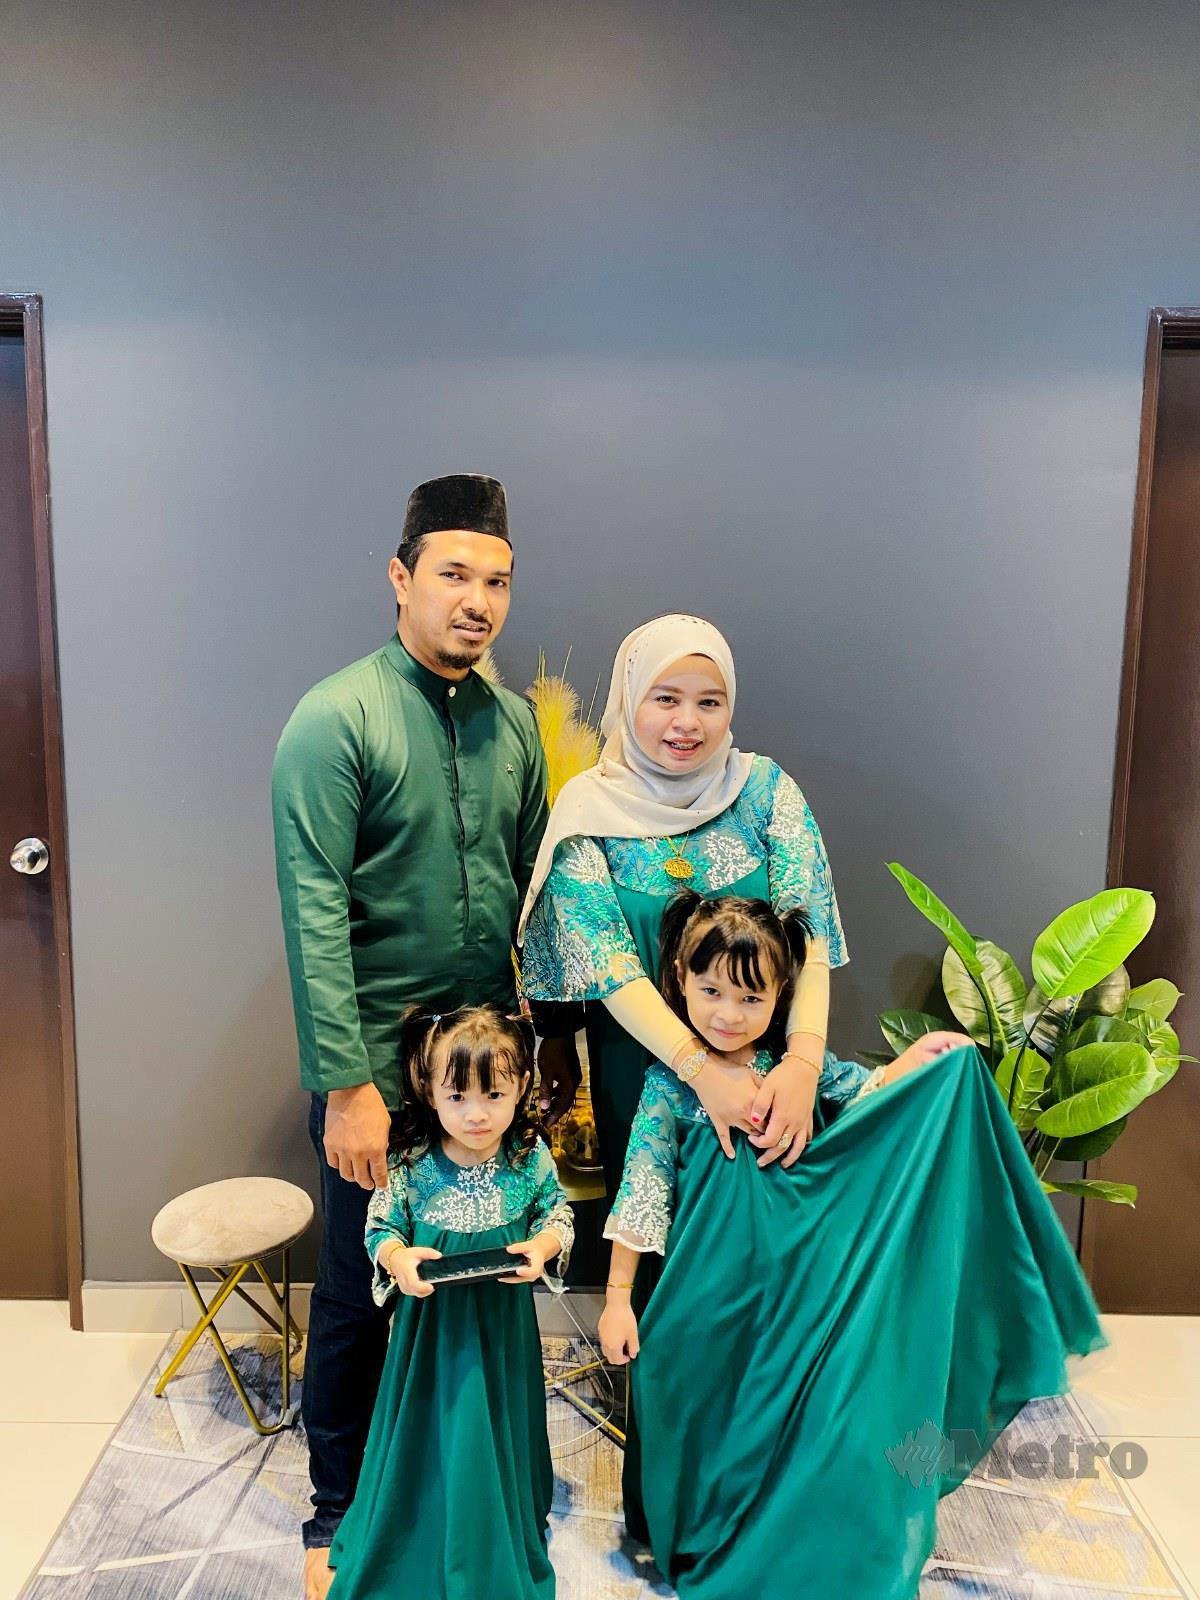 NOORFATINA (kanan) bersama keluarga pertama kali menyambut Aidilfitri di kediaman baru.